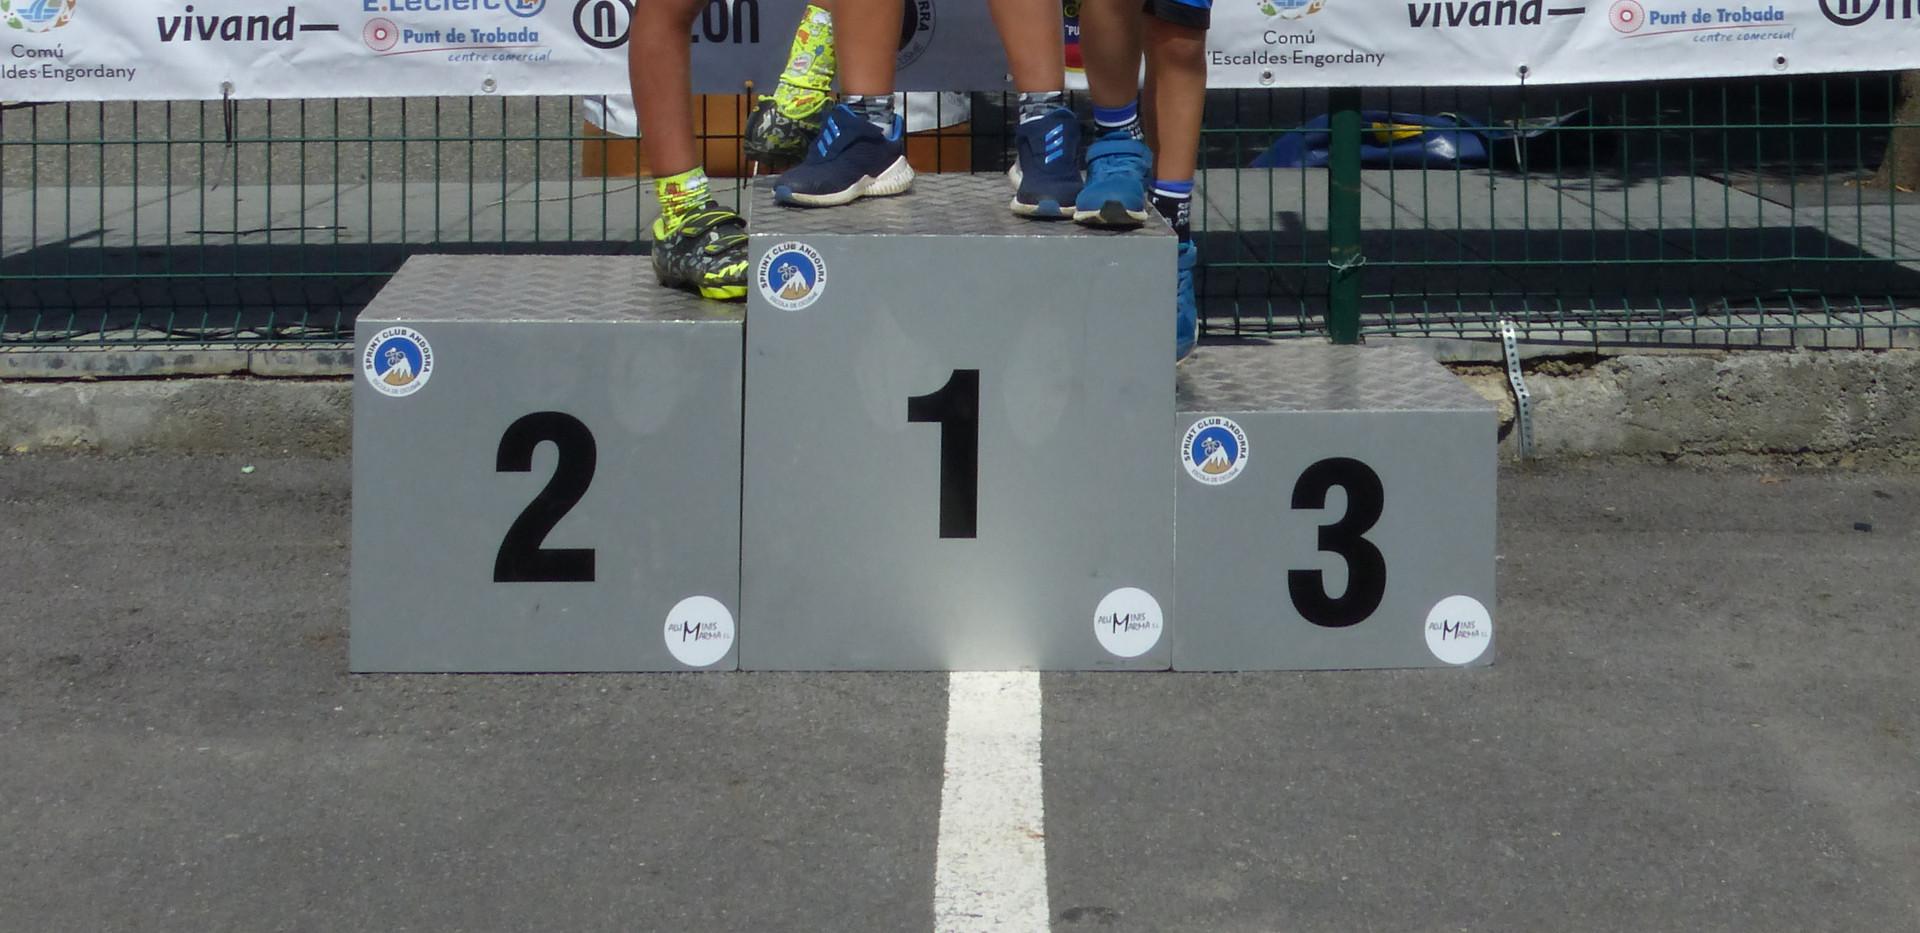 2on GP Purito Rodriguez265.JPG